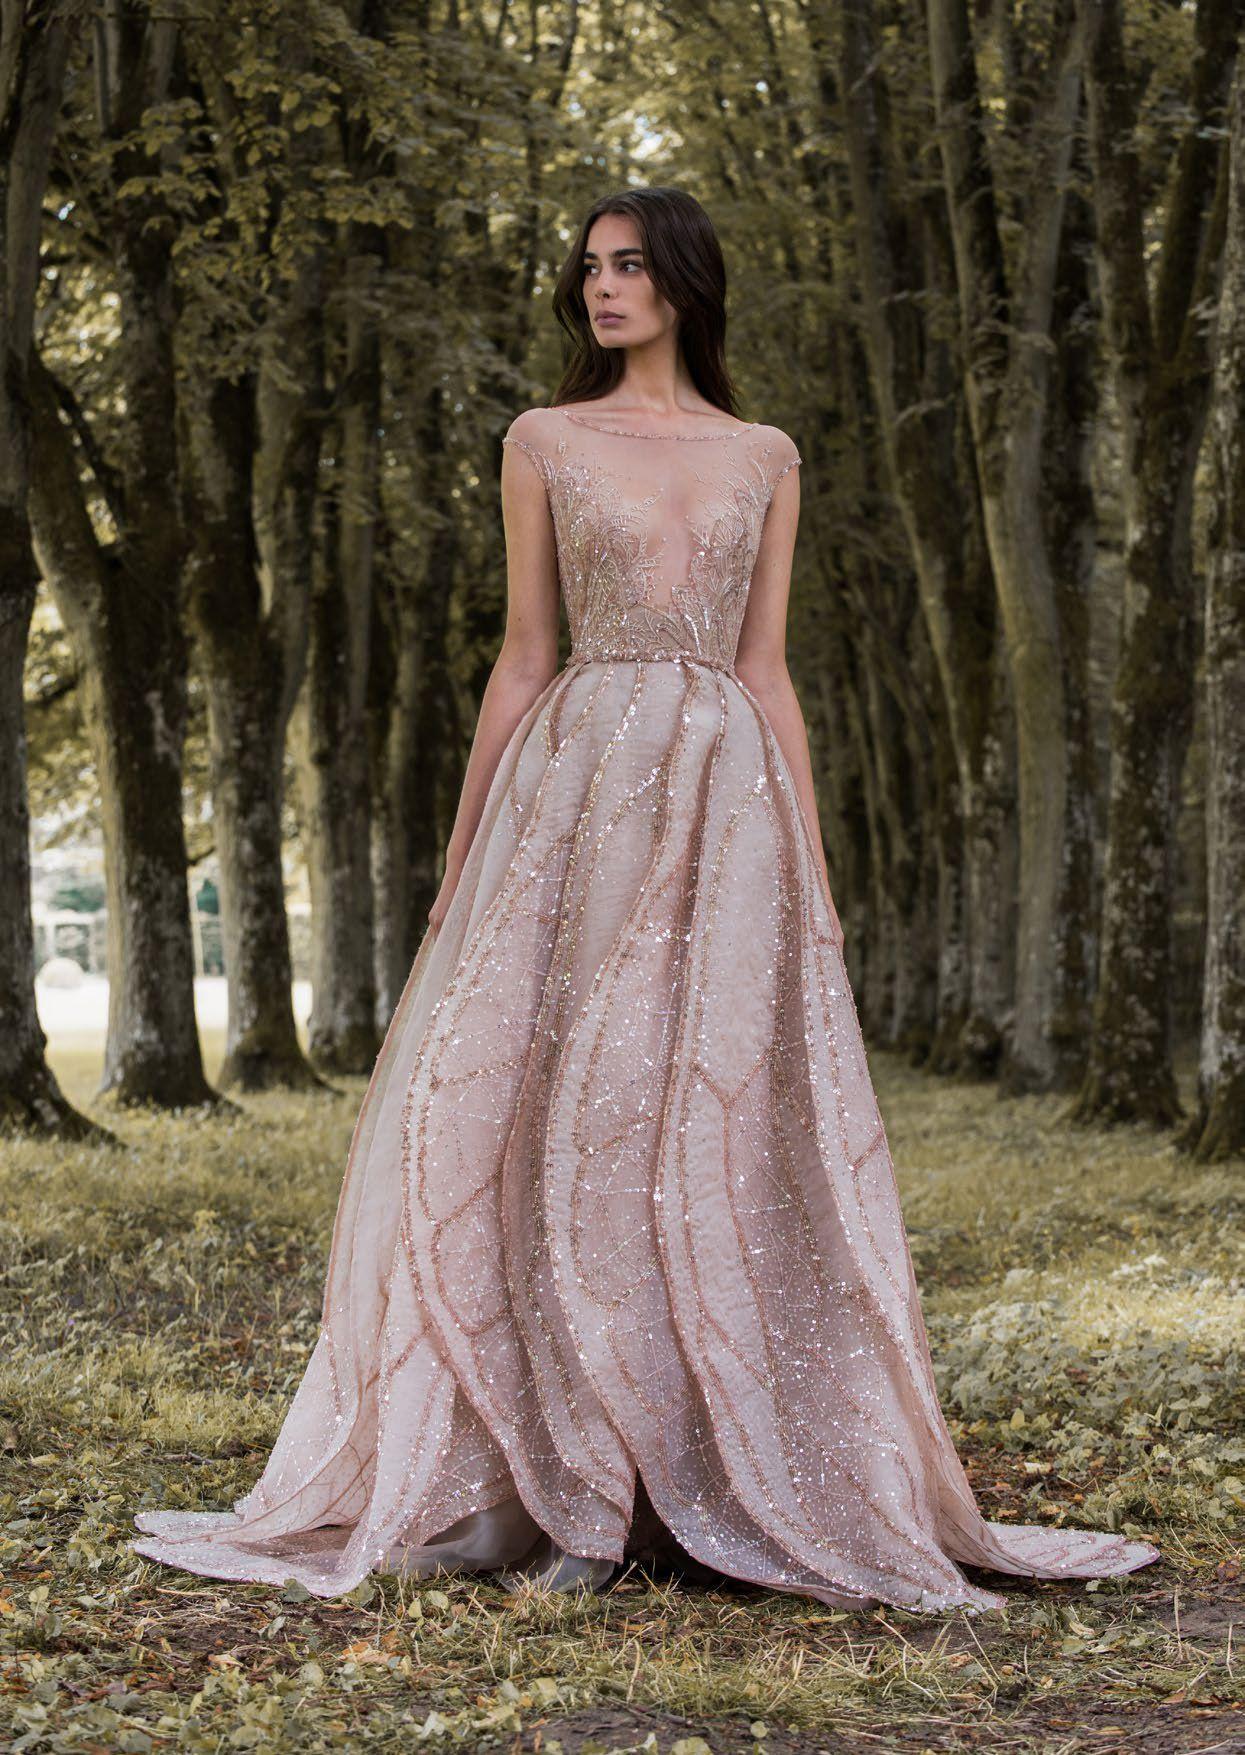 Rose gold dragonfly gossamer wing-inspired wedding dress ...